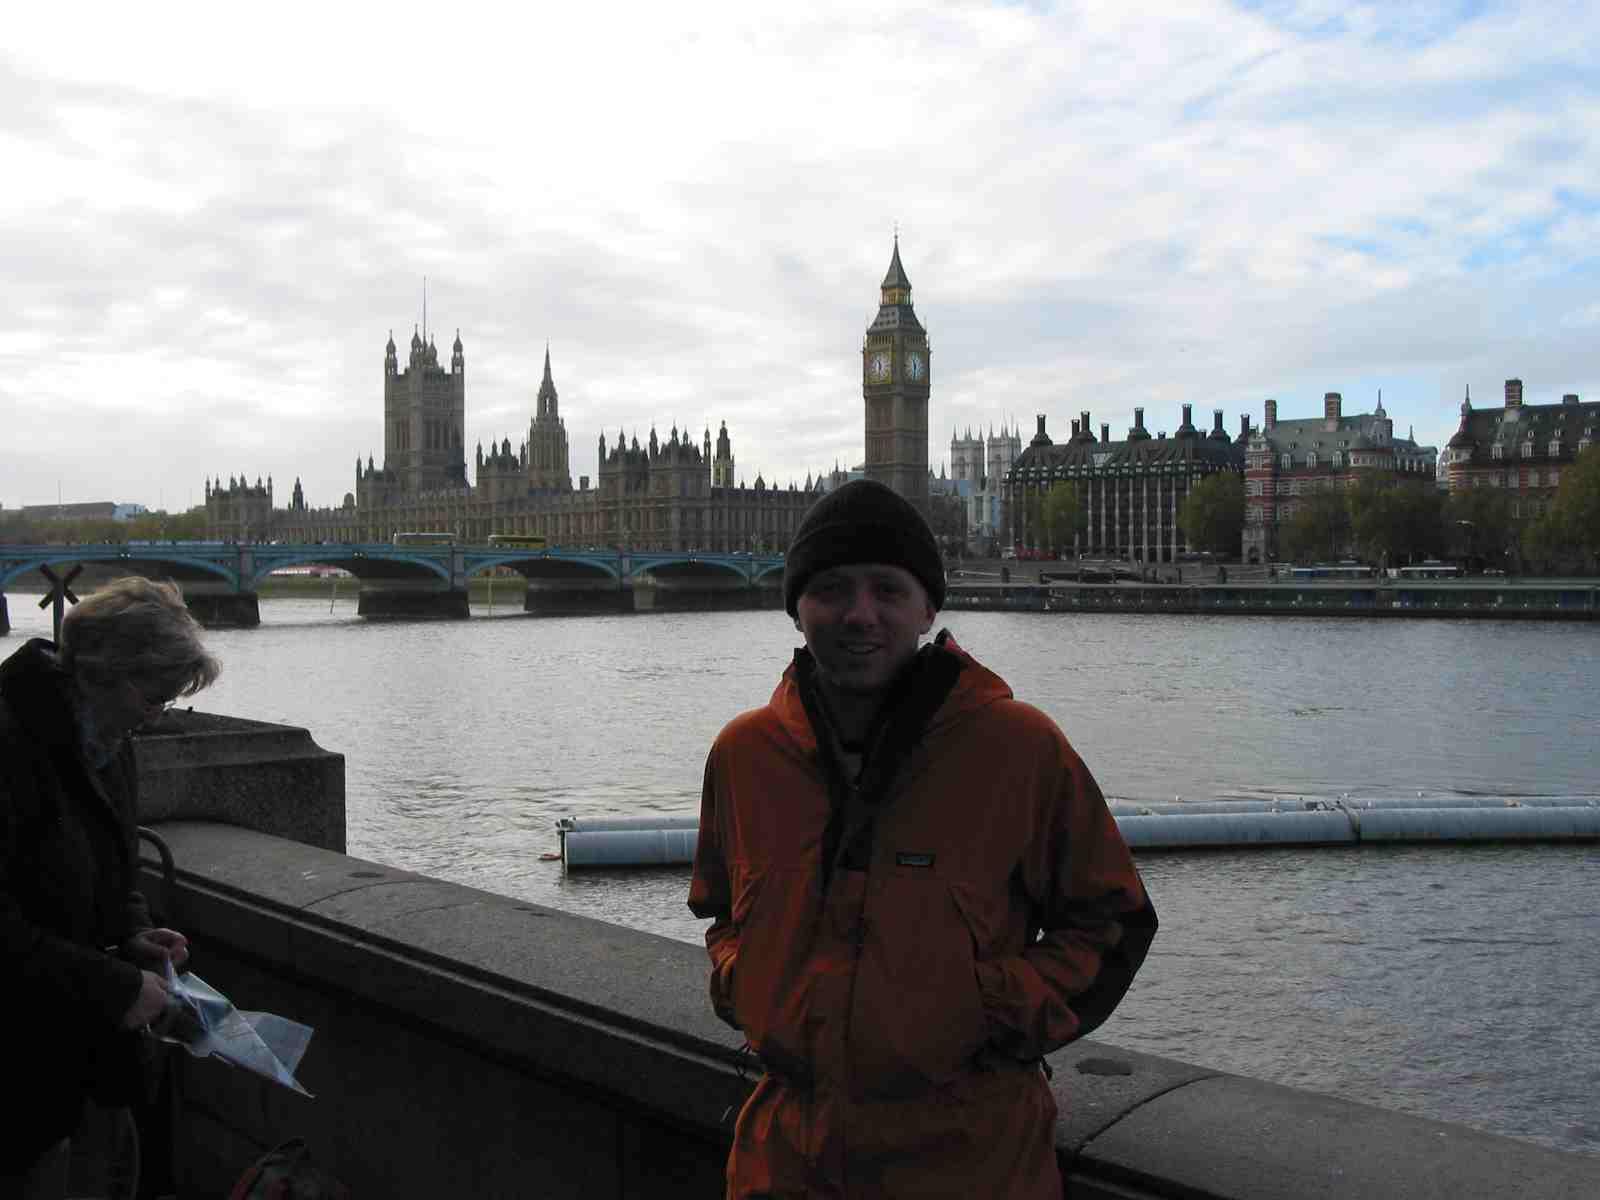 Big Ben & Parliment